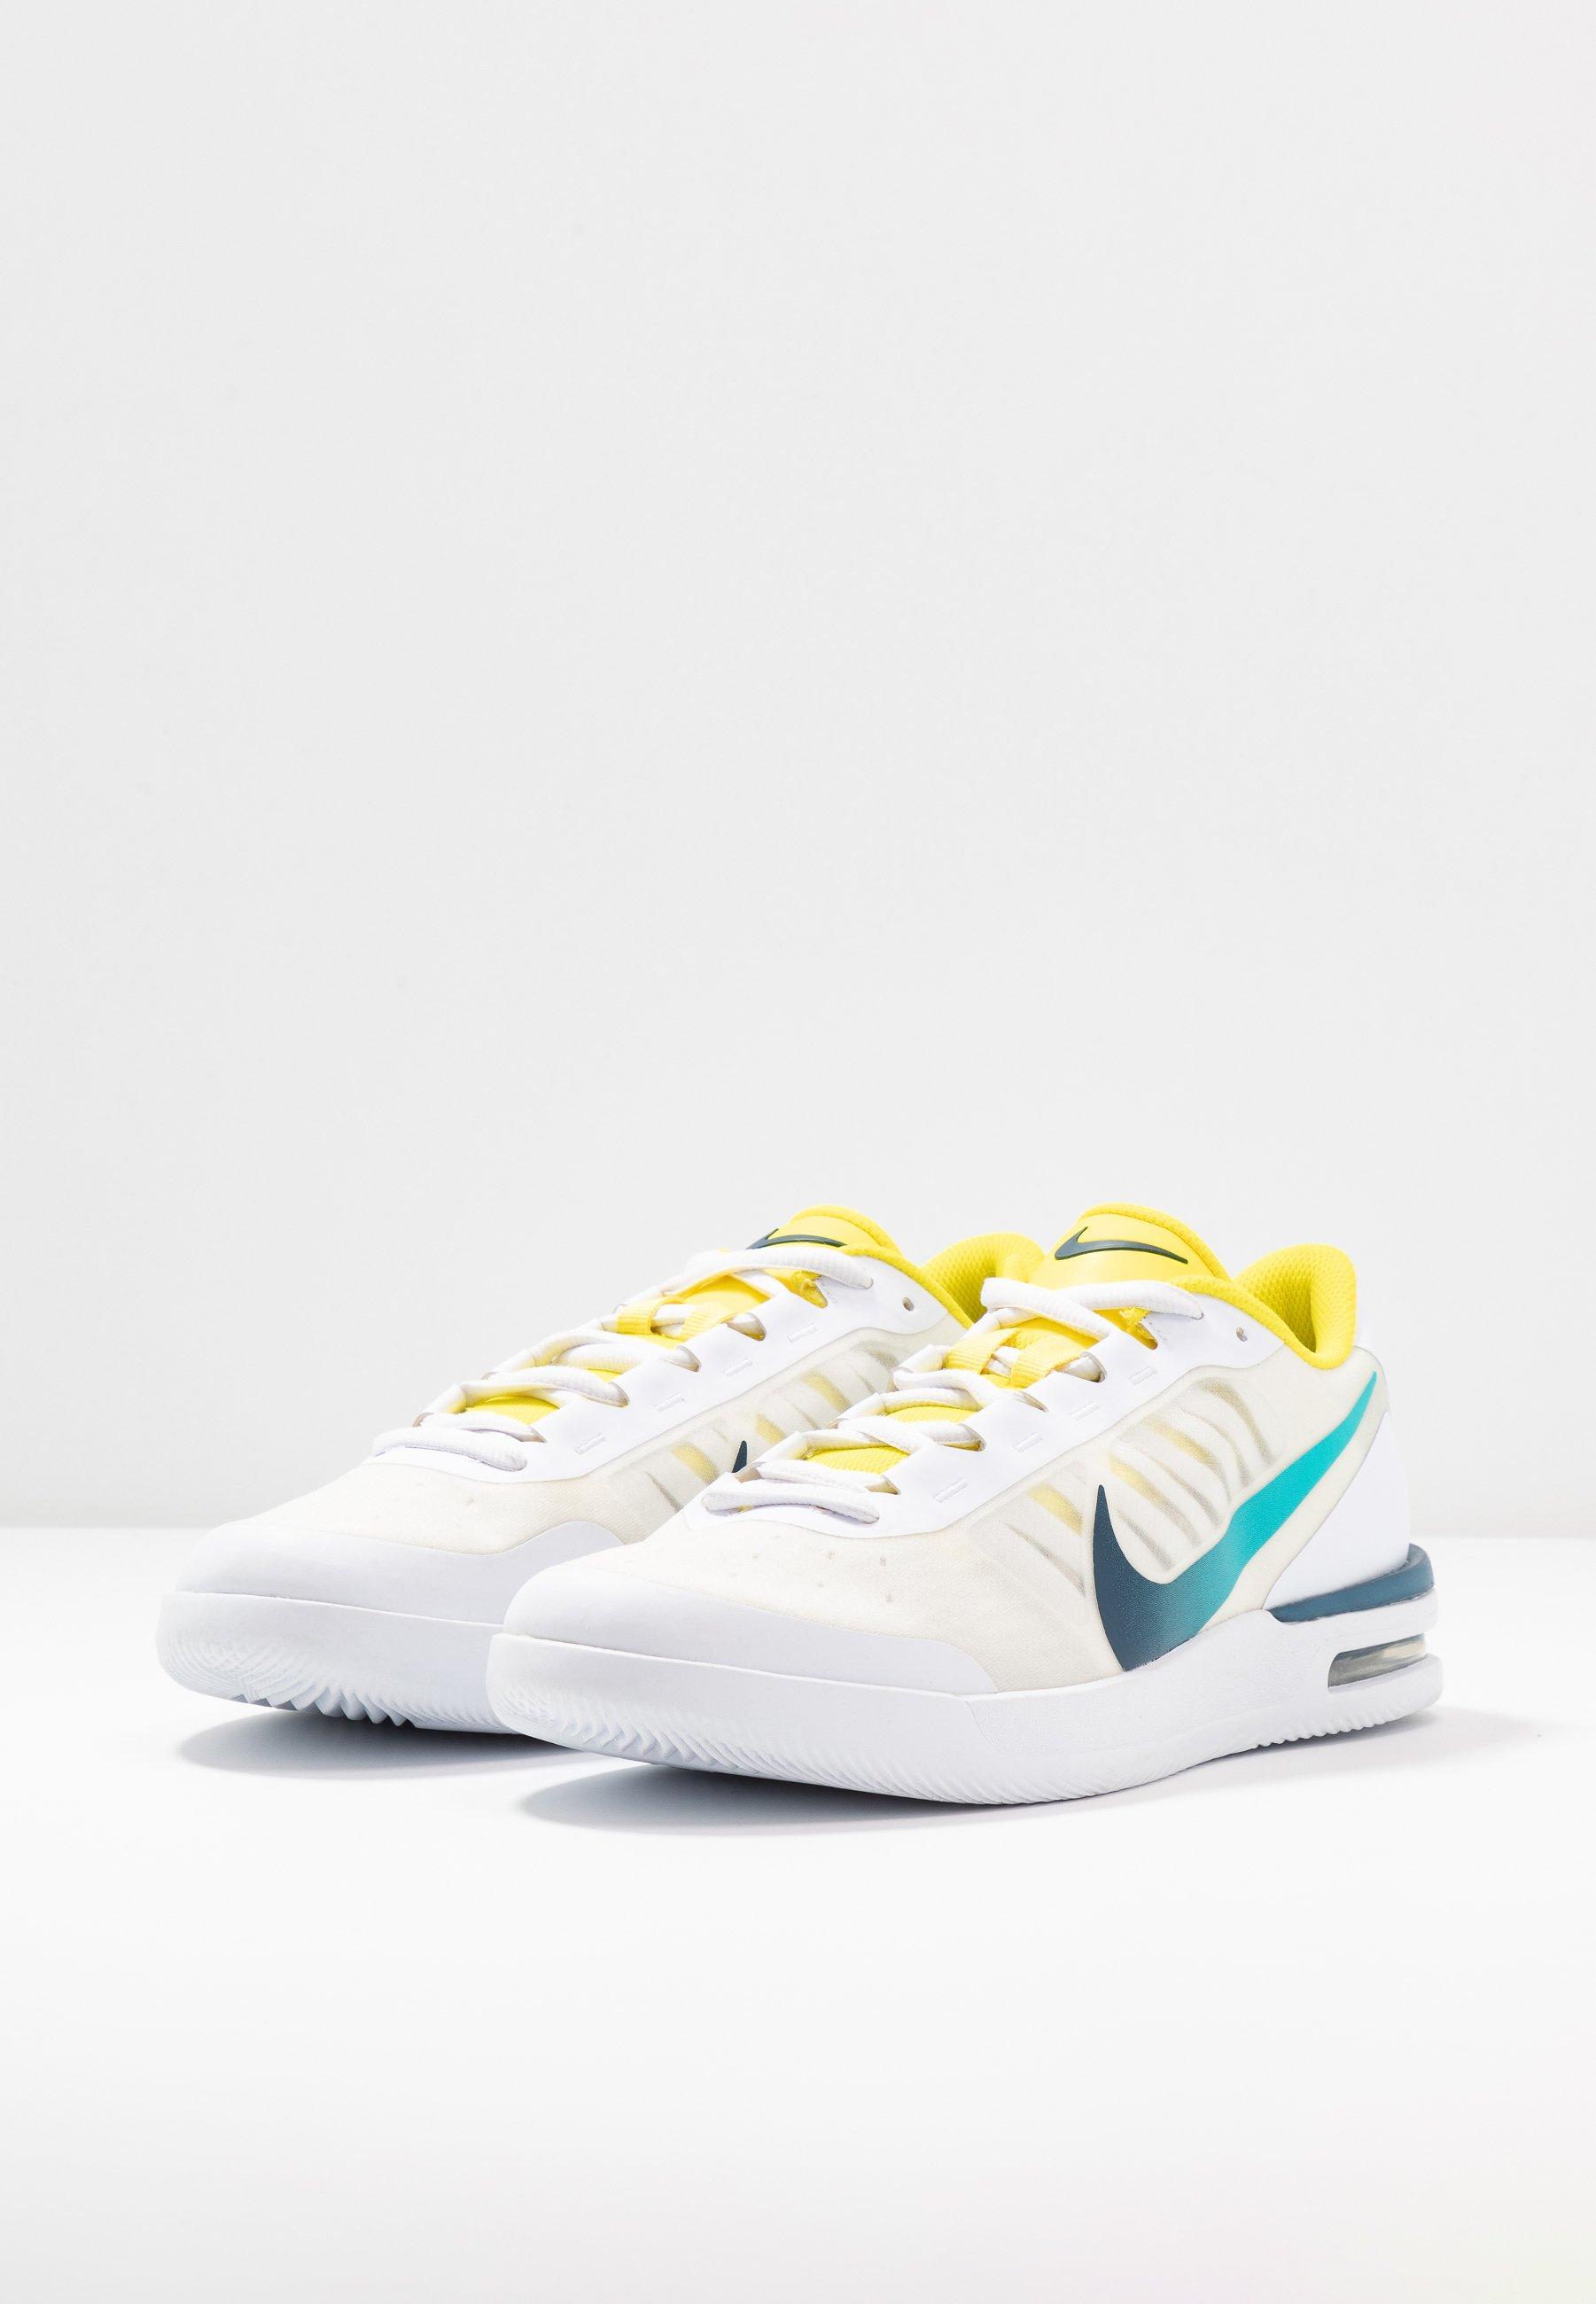 COURT AIR MAX VAPOR WING Chaussures de tennis toutes surfaces whitevalerian blueoracle aqua